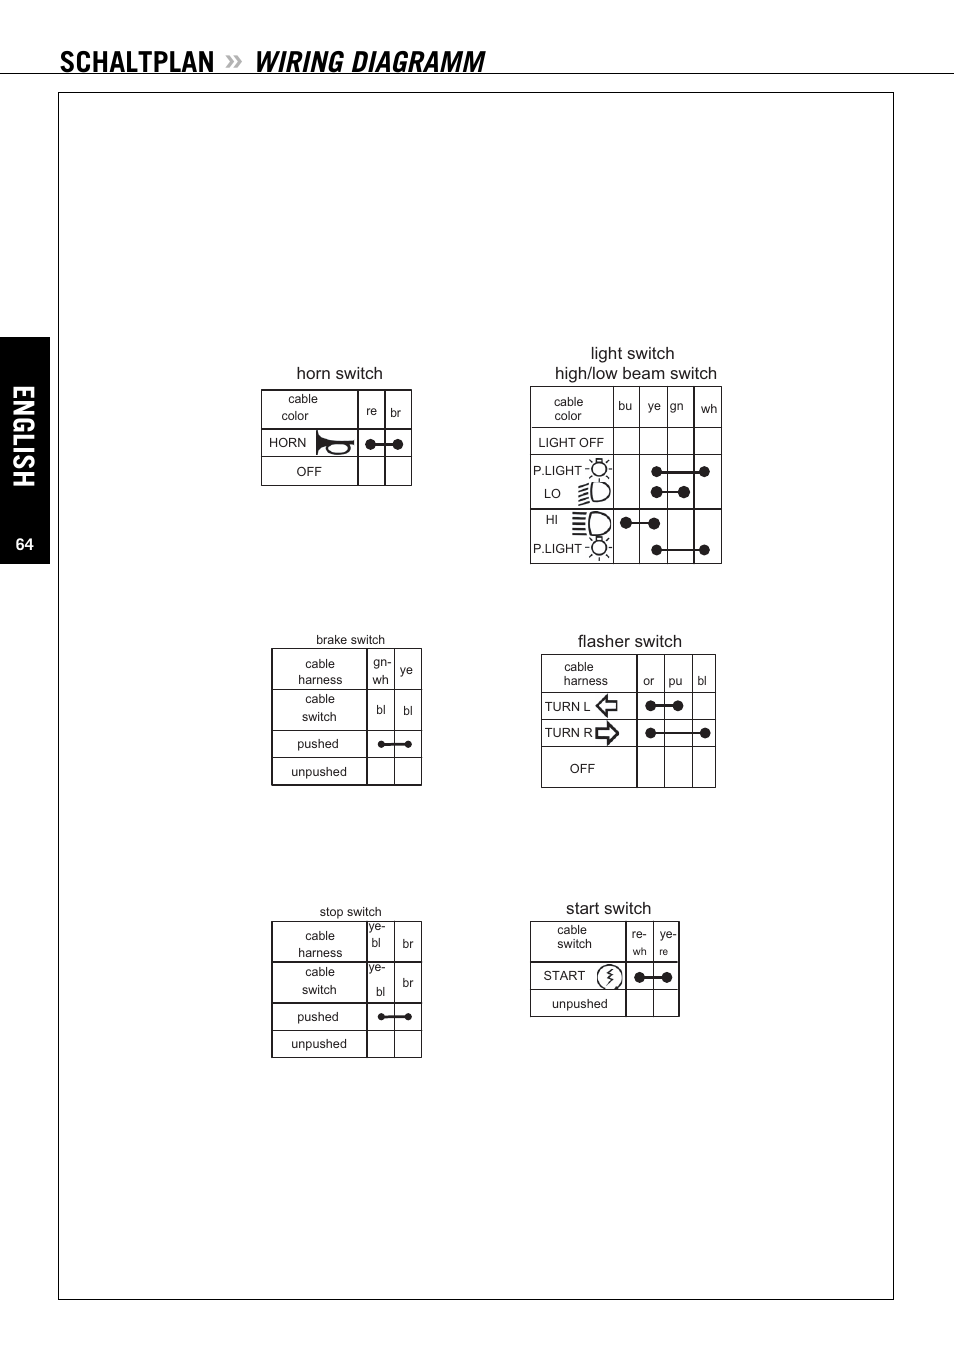 English, Schaltplan, Wiring diagramm | KTM 125 EXC-E SIX DAYS User Manual |  Page 65 / 74